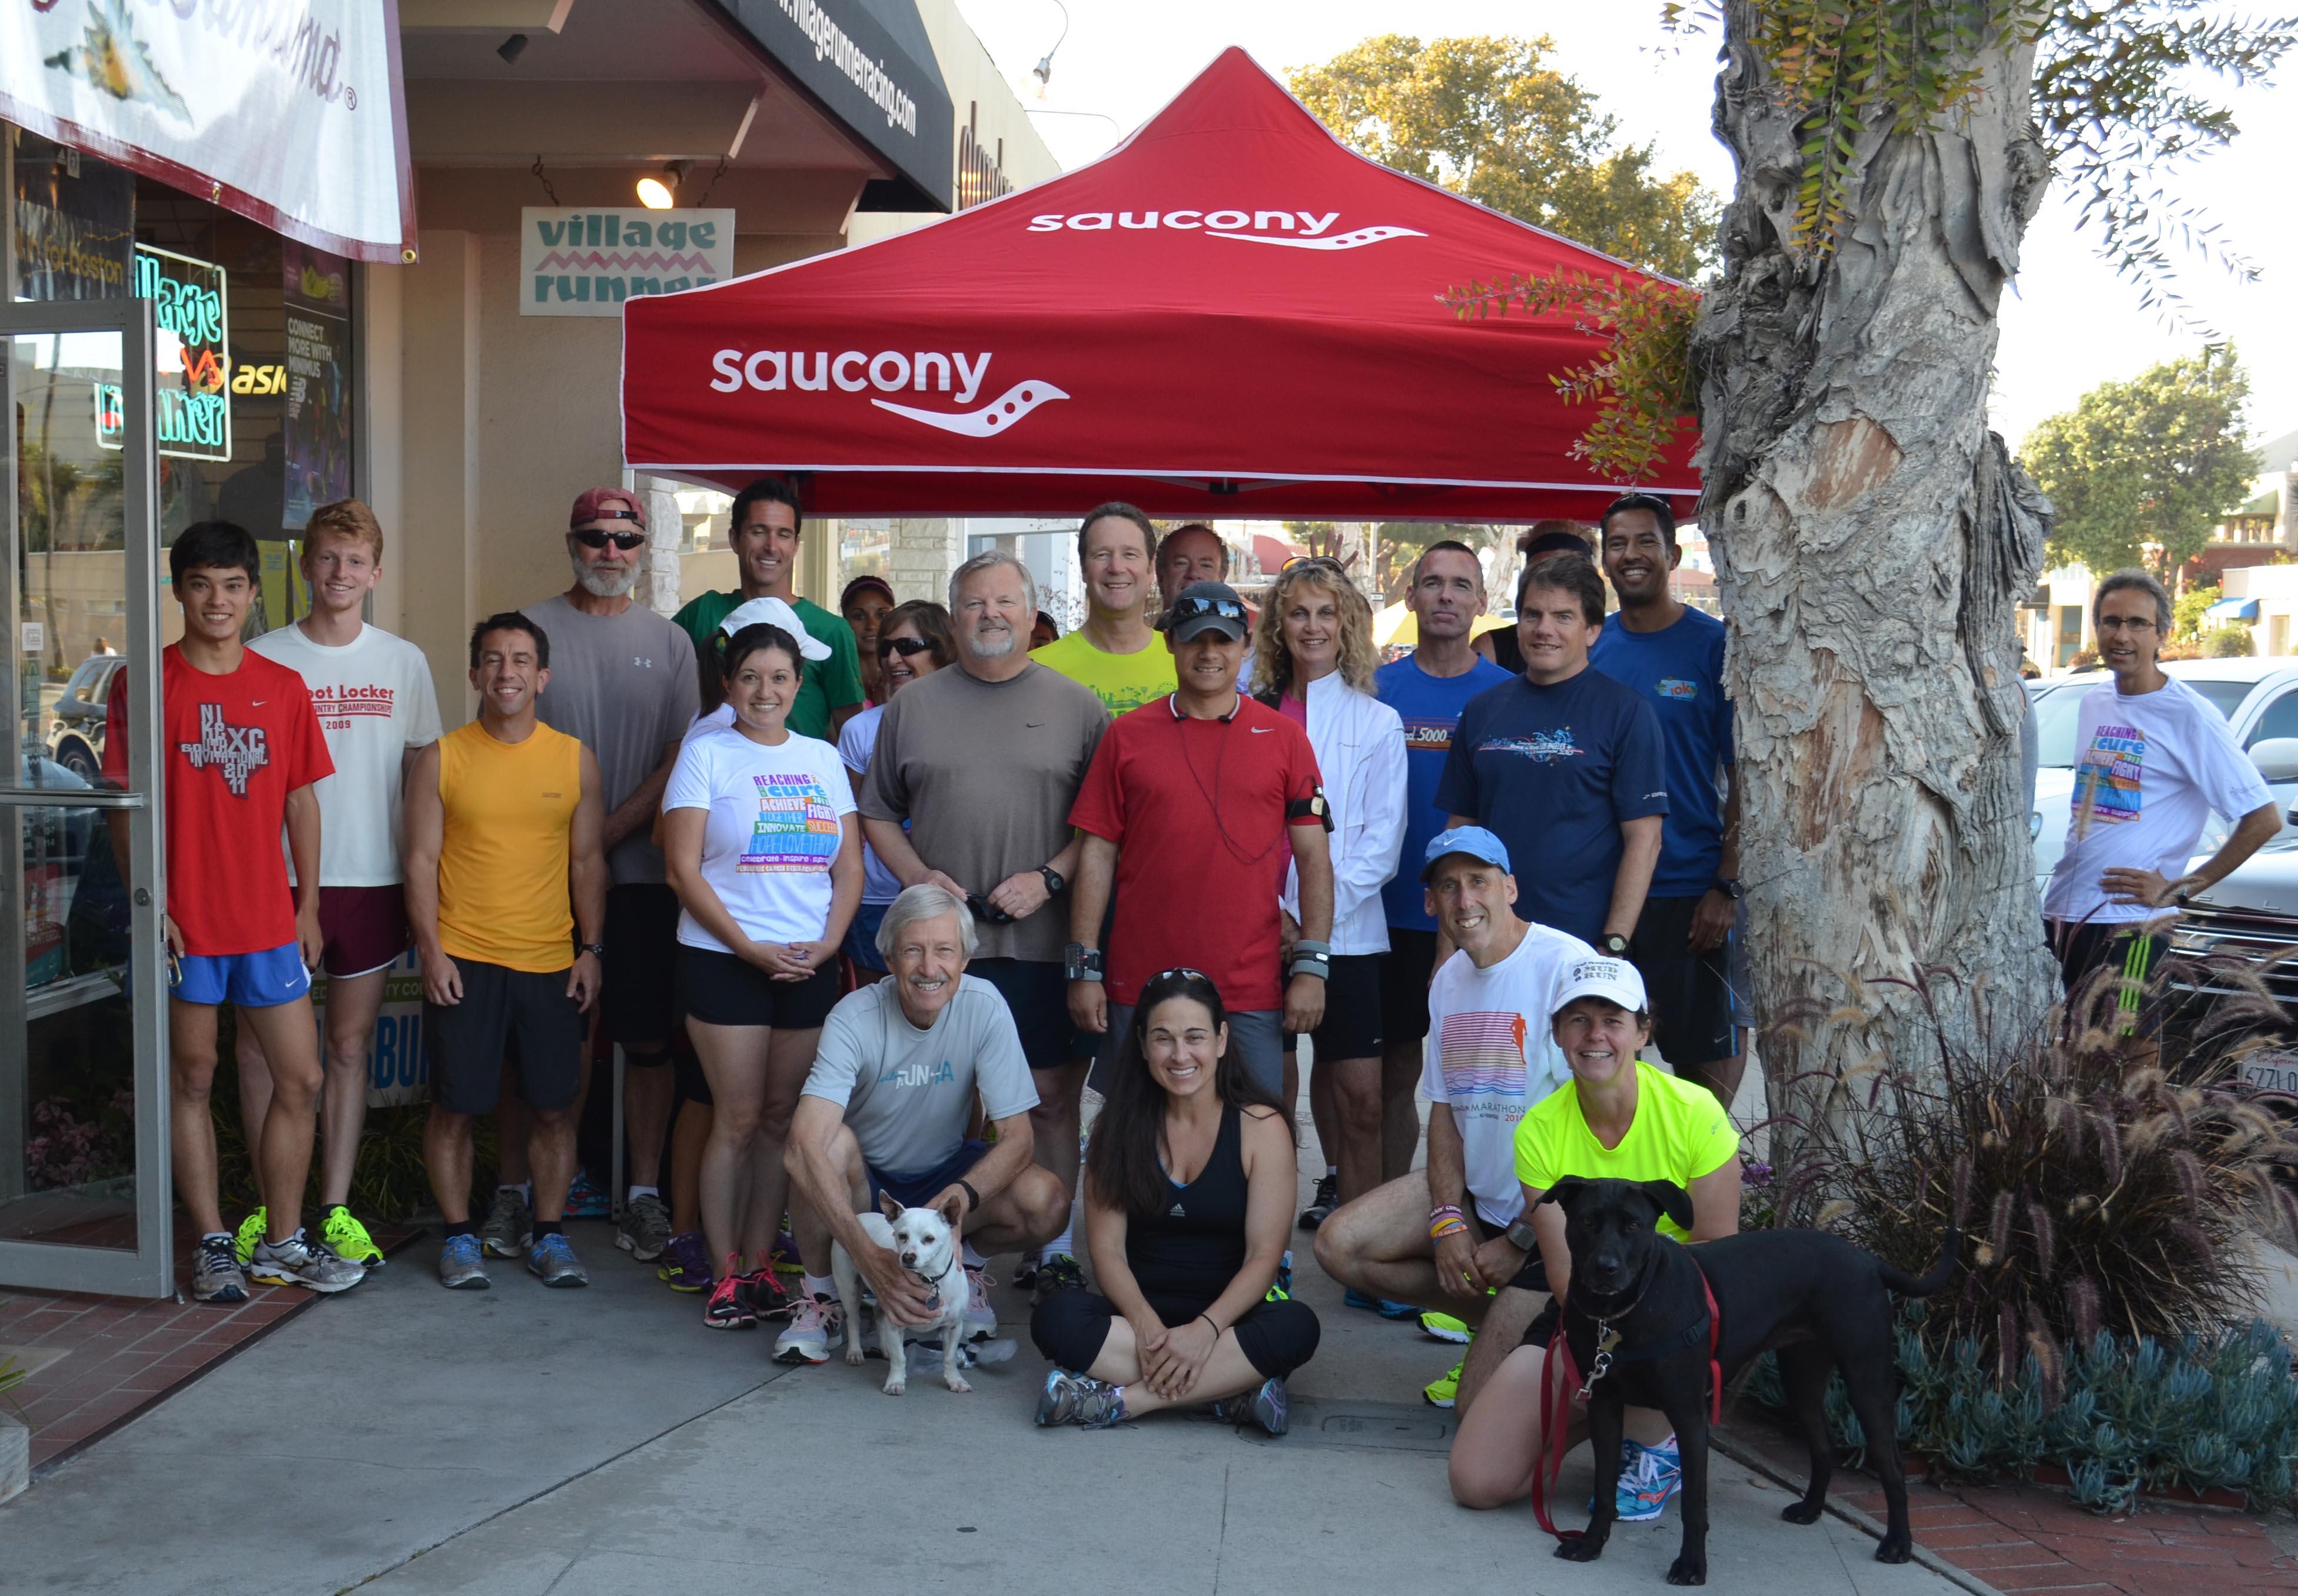 Village Runner South Catalina Avenue Redondo Beach Ca